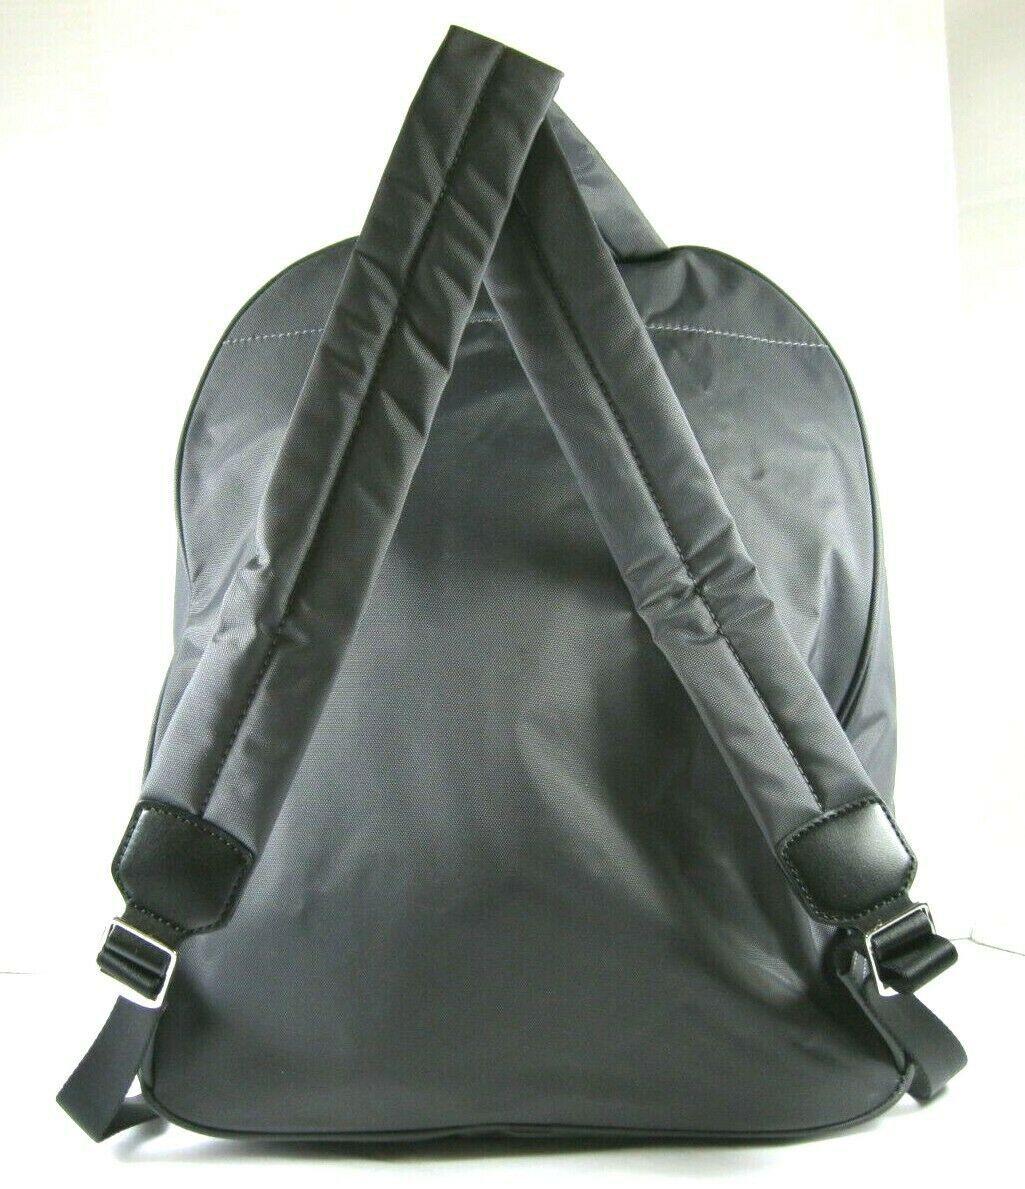 Marc Jacobs NWT $195 Shadow Grey Backpack Book Bag Medium Nylon Zip Around Logo image 2